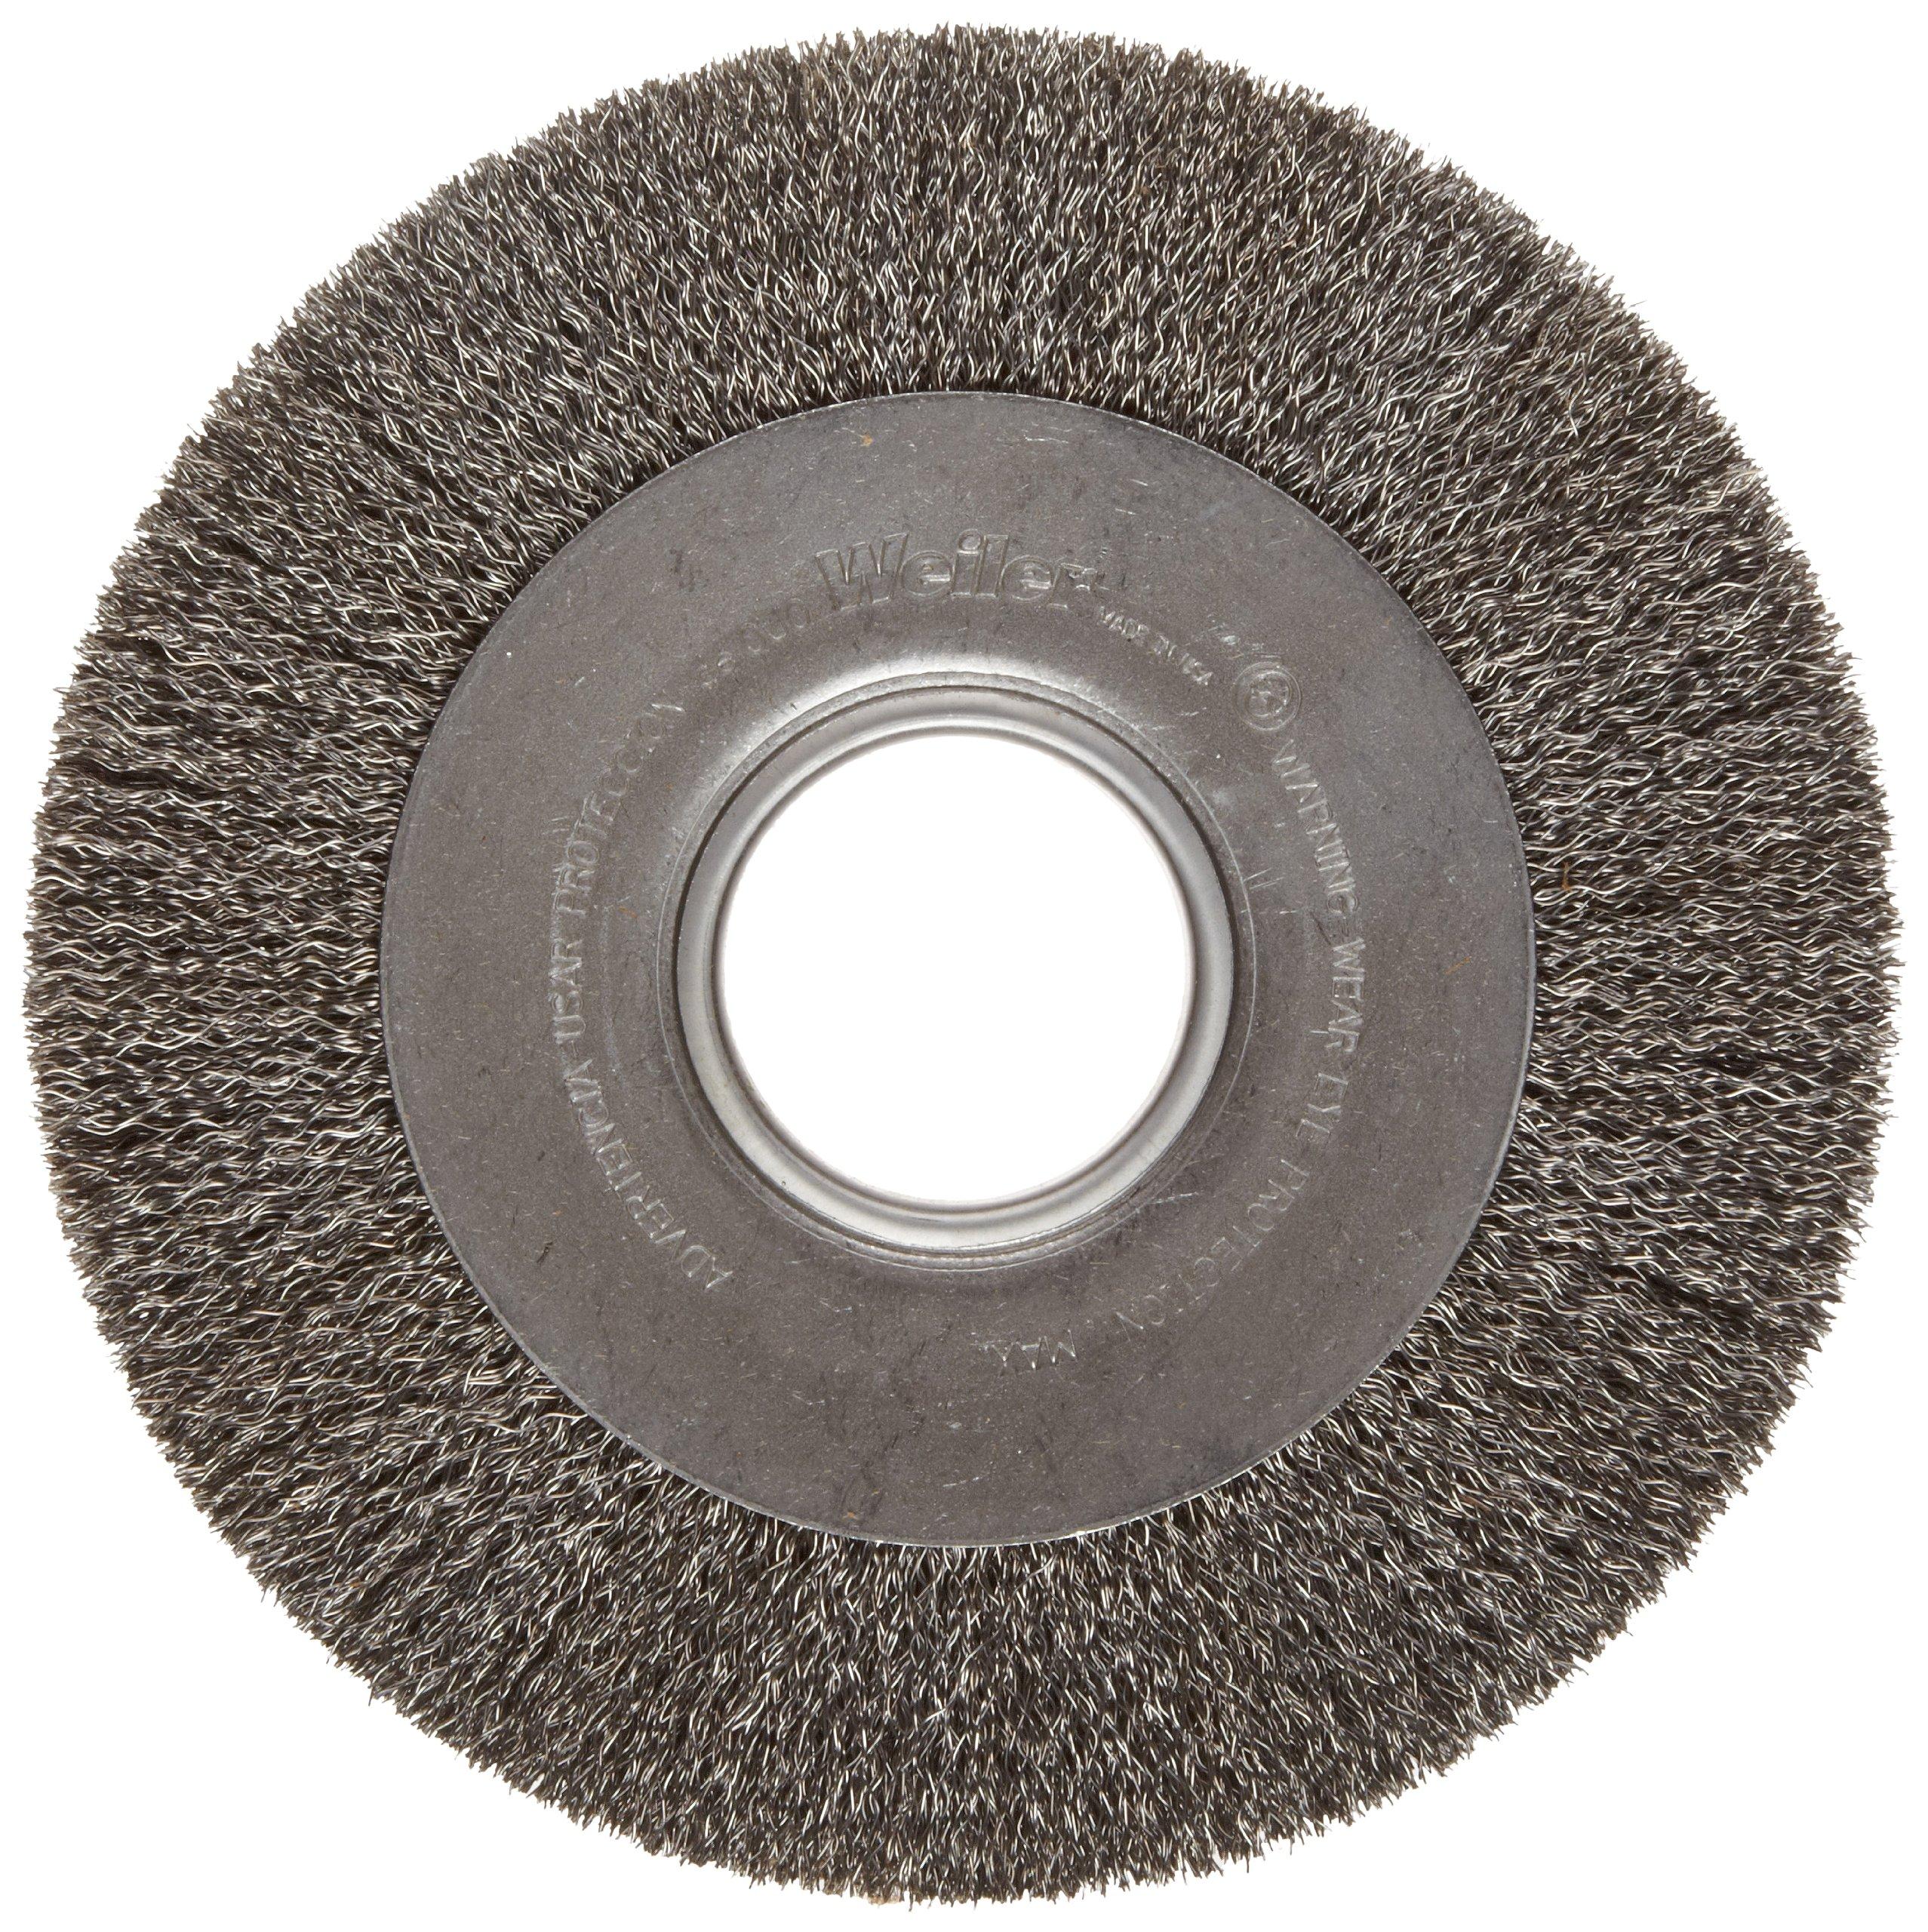 Weiler Trulock Medium Face Wire Wheel Brush, Round Hole, Steel, Crimped Wire, 8'' Diameter, 0.014'' Wire Diameter, 2'' Arbor, 1-3/8'' Bristle Length, 1'' Brush Face Width, 4500 rpm by Weiler